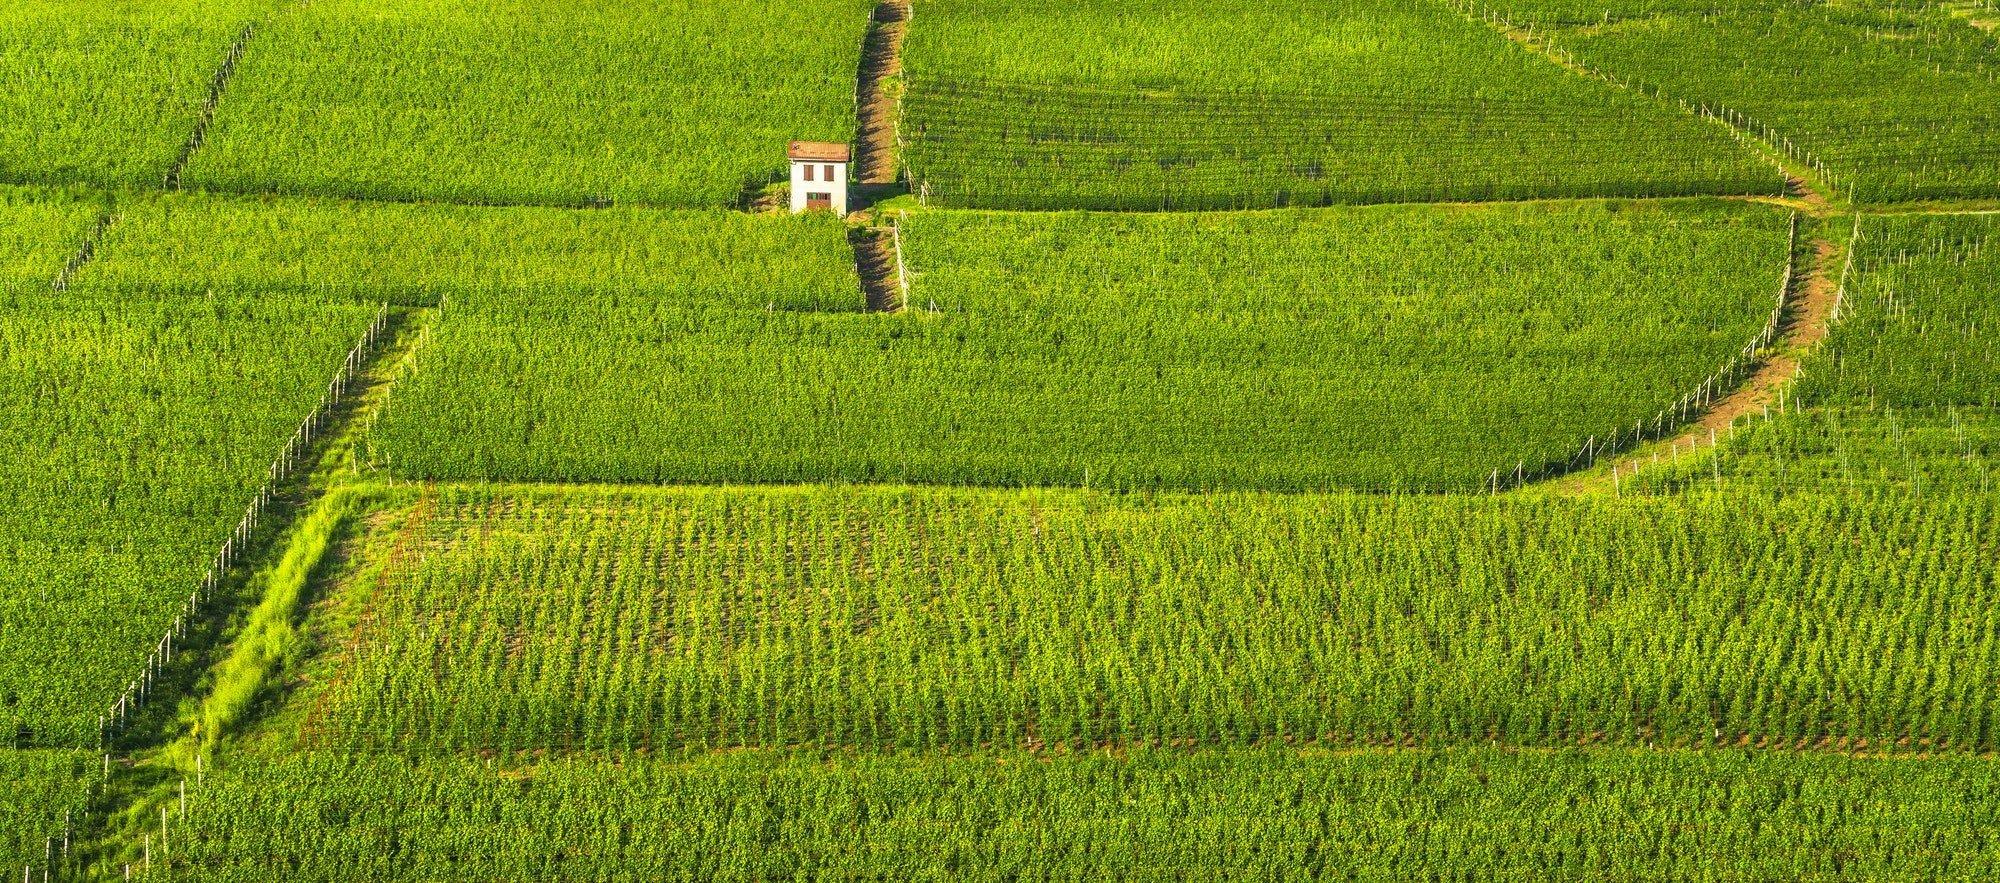 Langhe vineyards rows panorama, Barolo, Piedmont, Italy Europe.